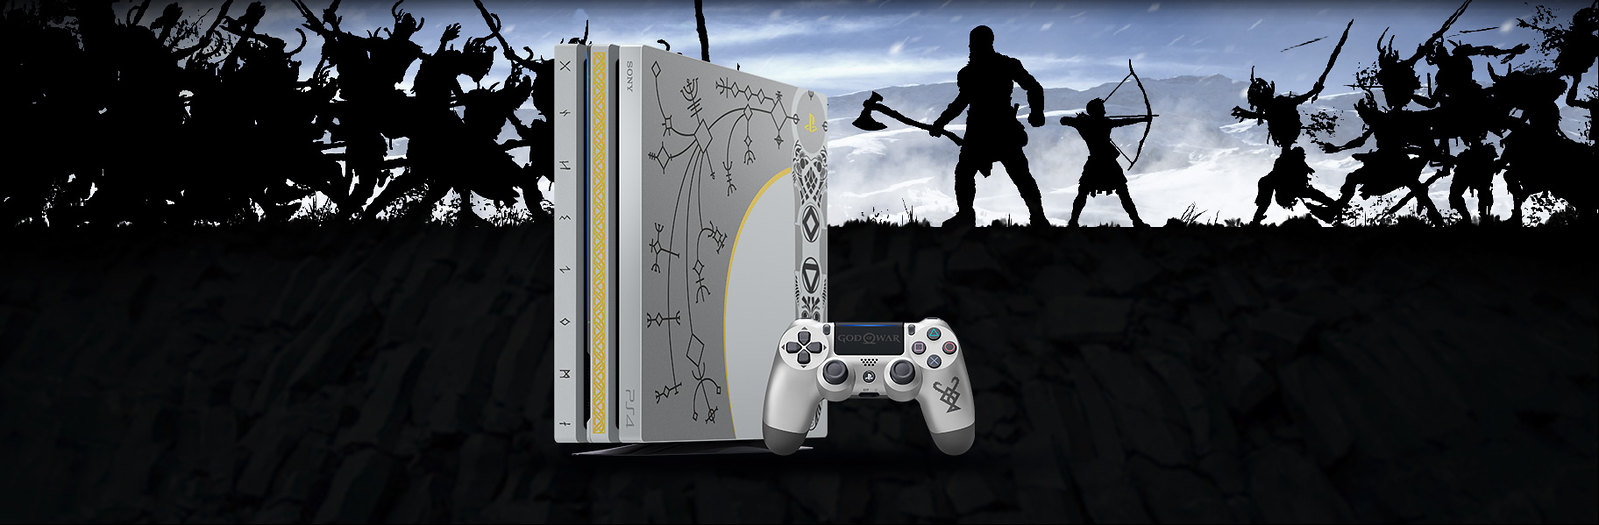 33855258068 fd913745ac h - God of War – Happy Birthday, Kratos